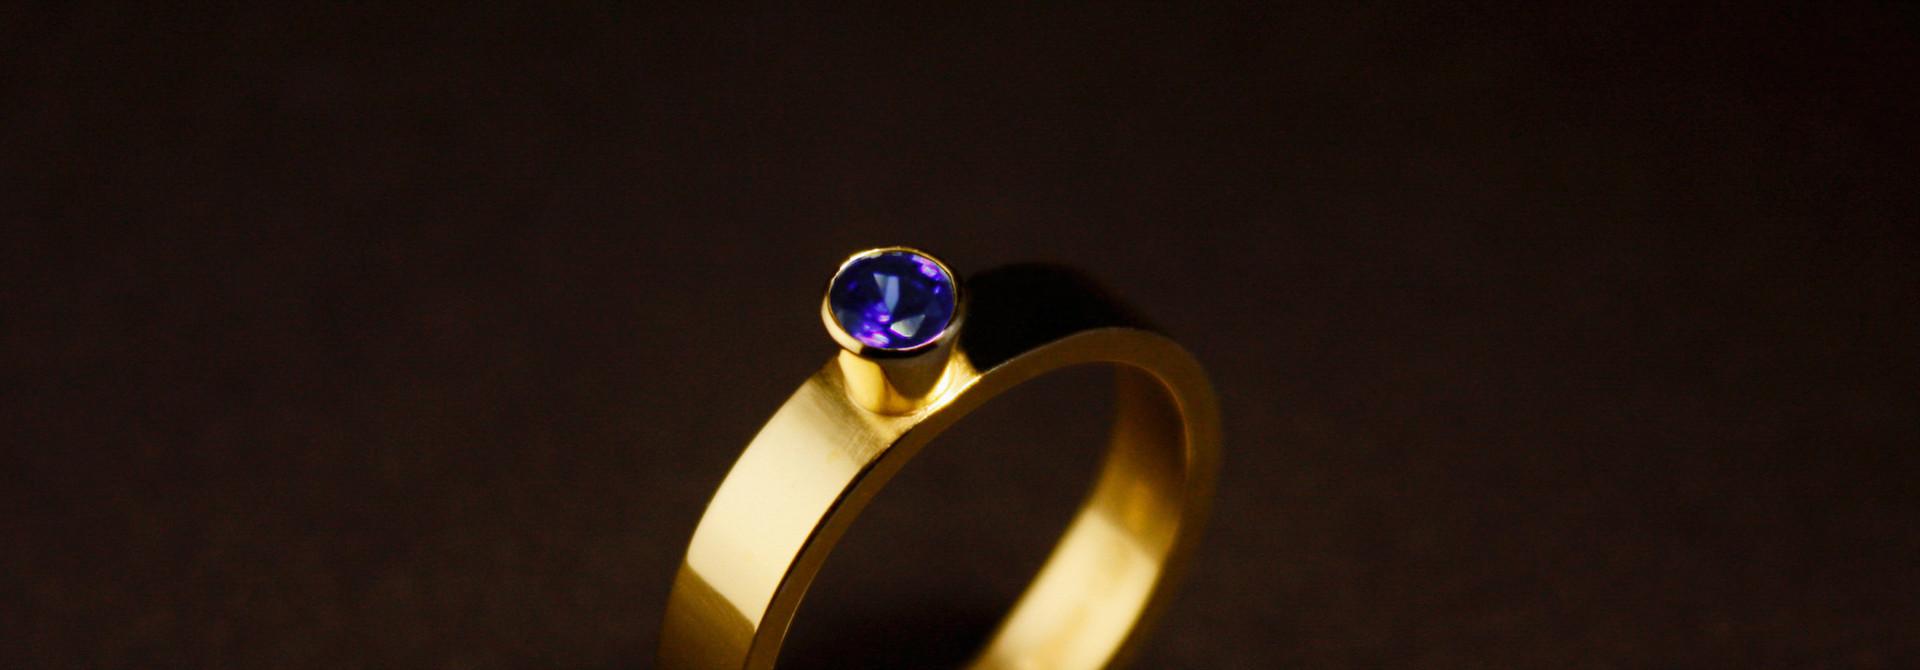 Ring WARE LIEFDE, goud